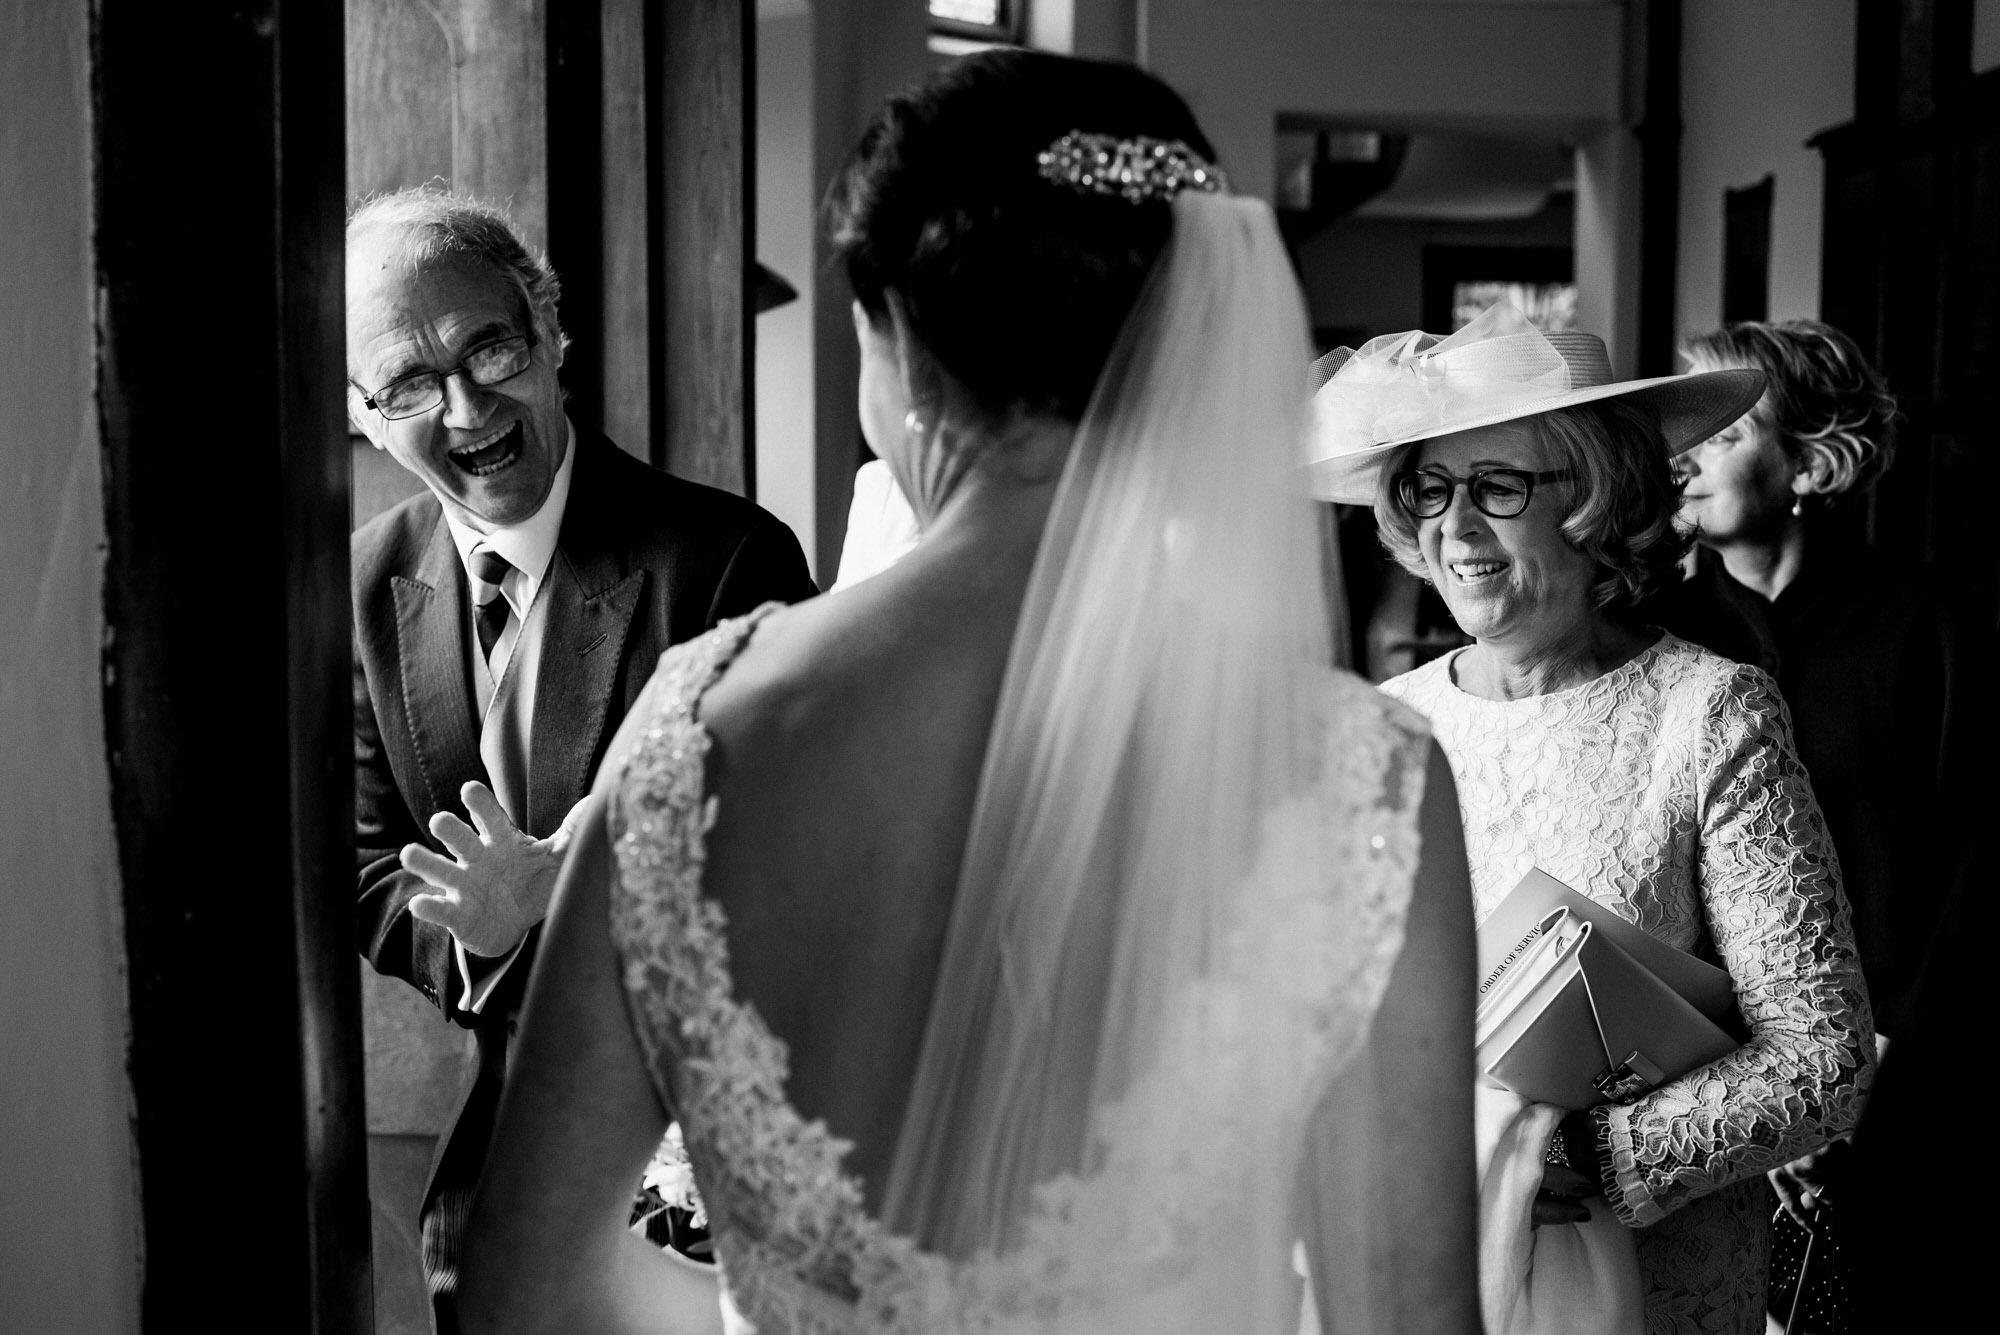 Kingswood school chapel wedding guests